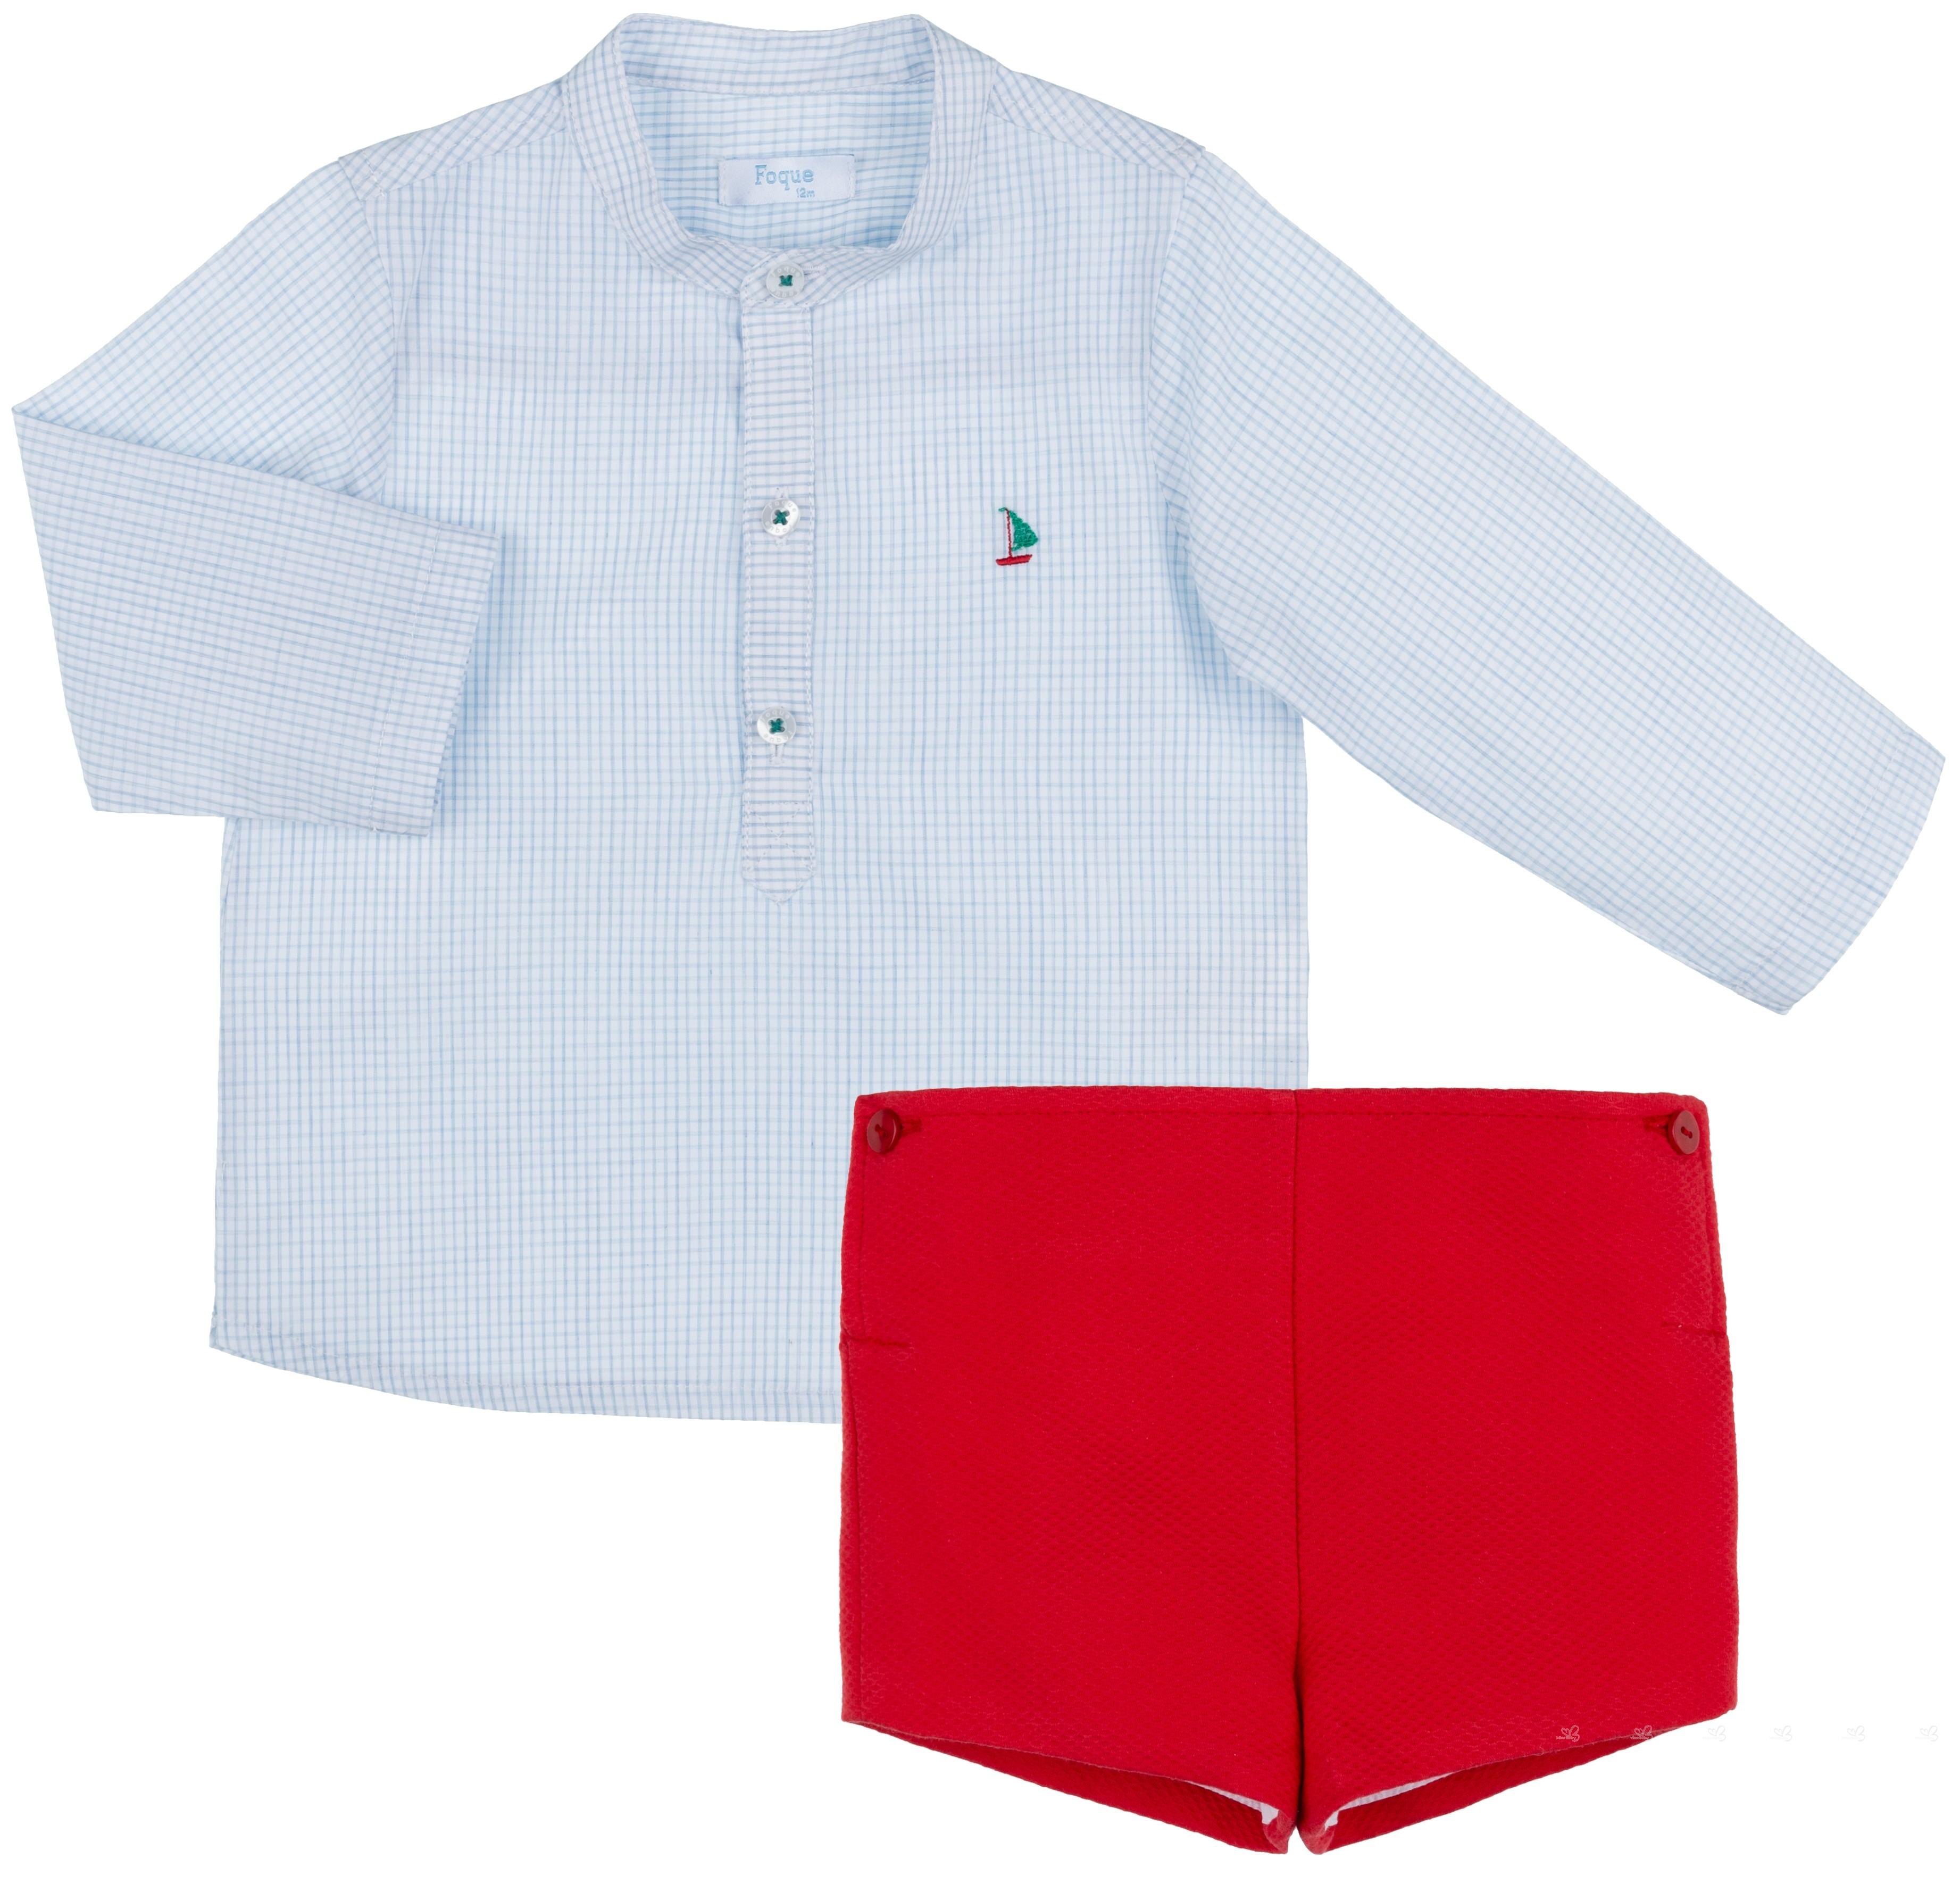 Niño Azulamp; Camisa RojoMissbaby Foque Short Piqué Conjunto Cuadros XuTPkOZi